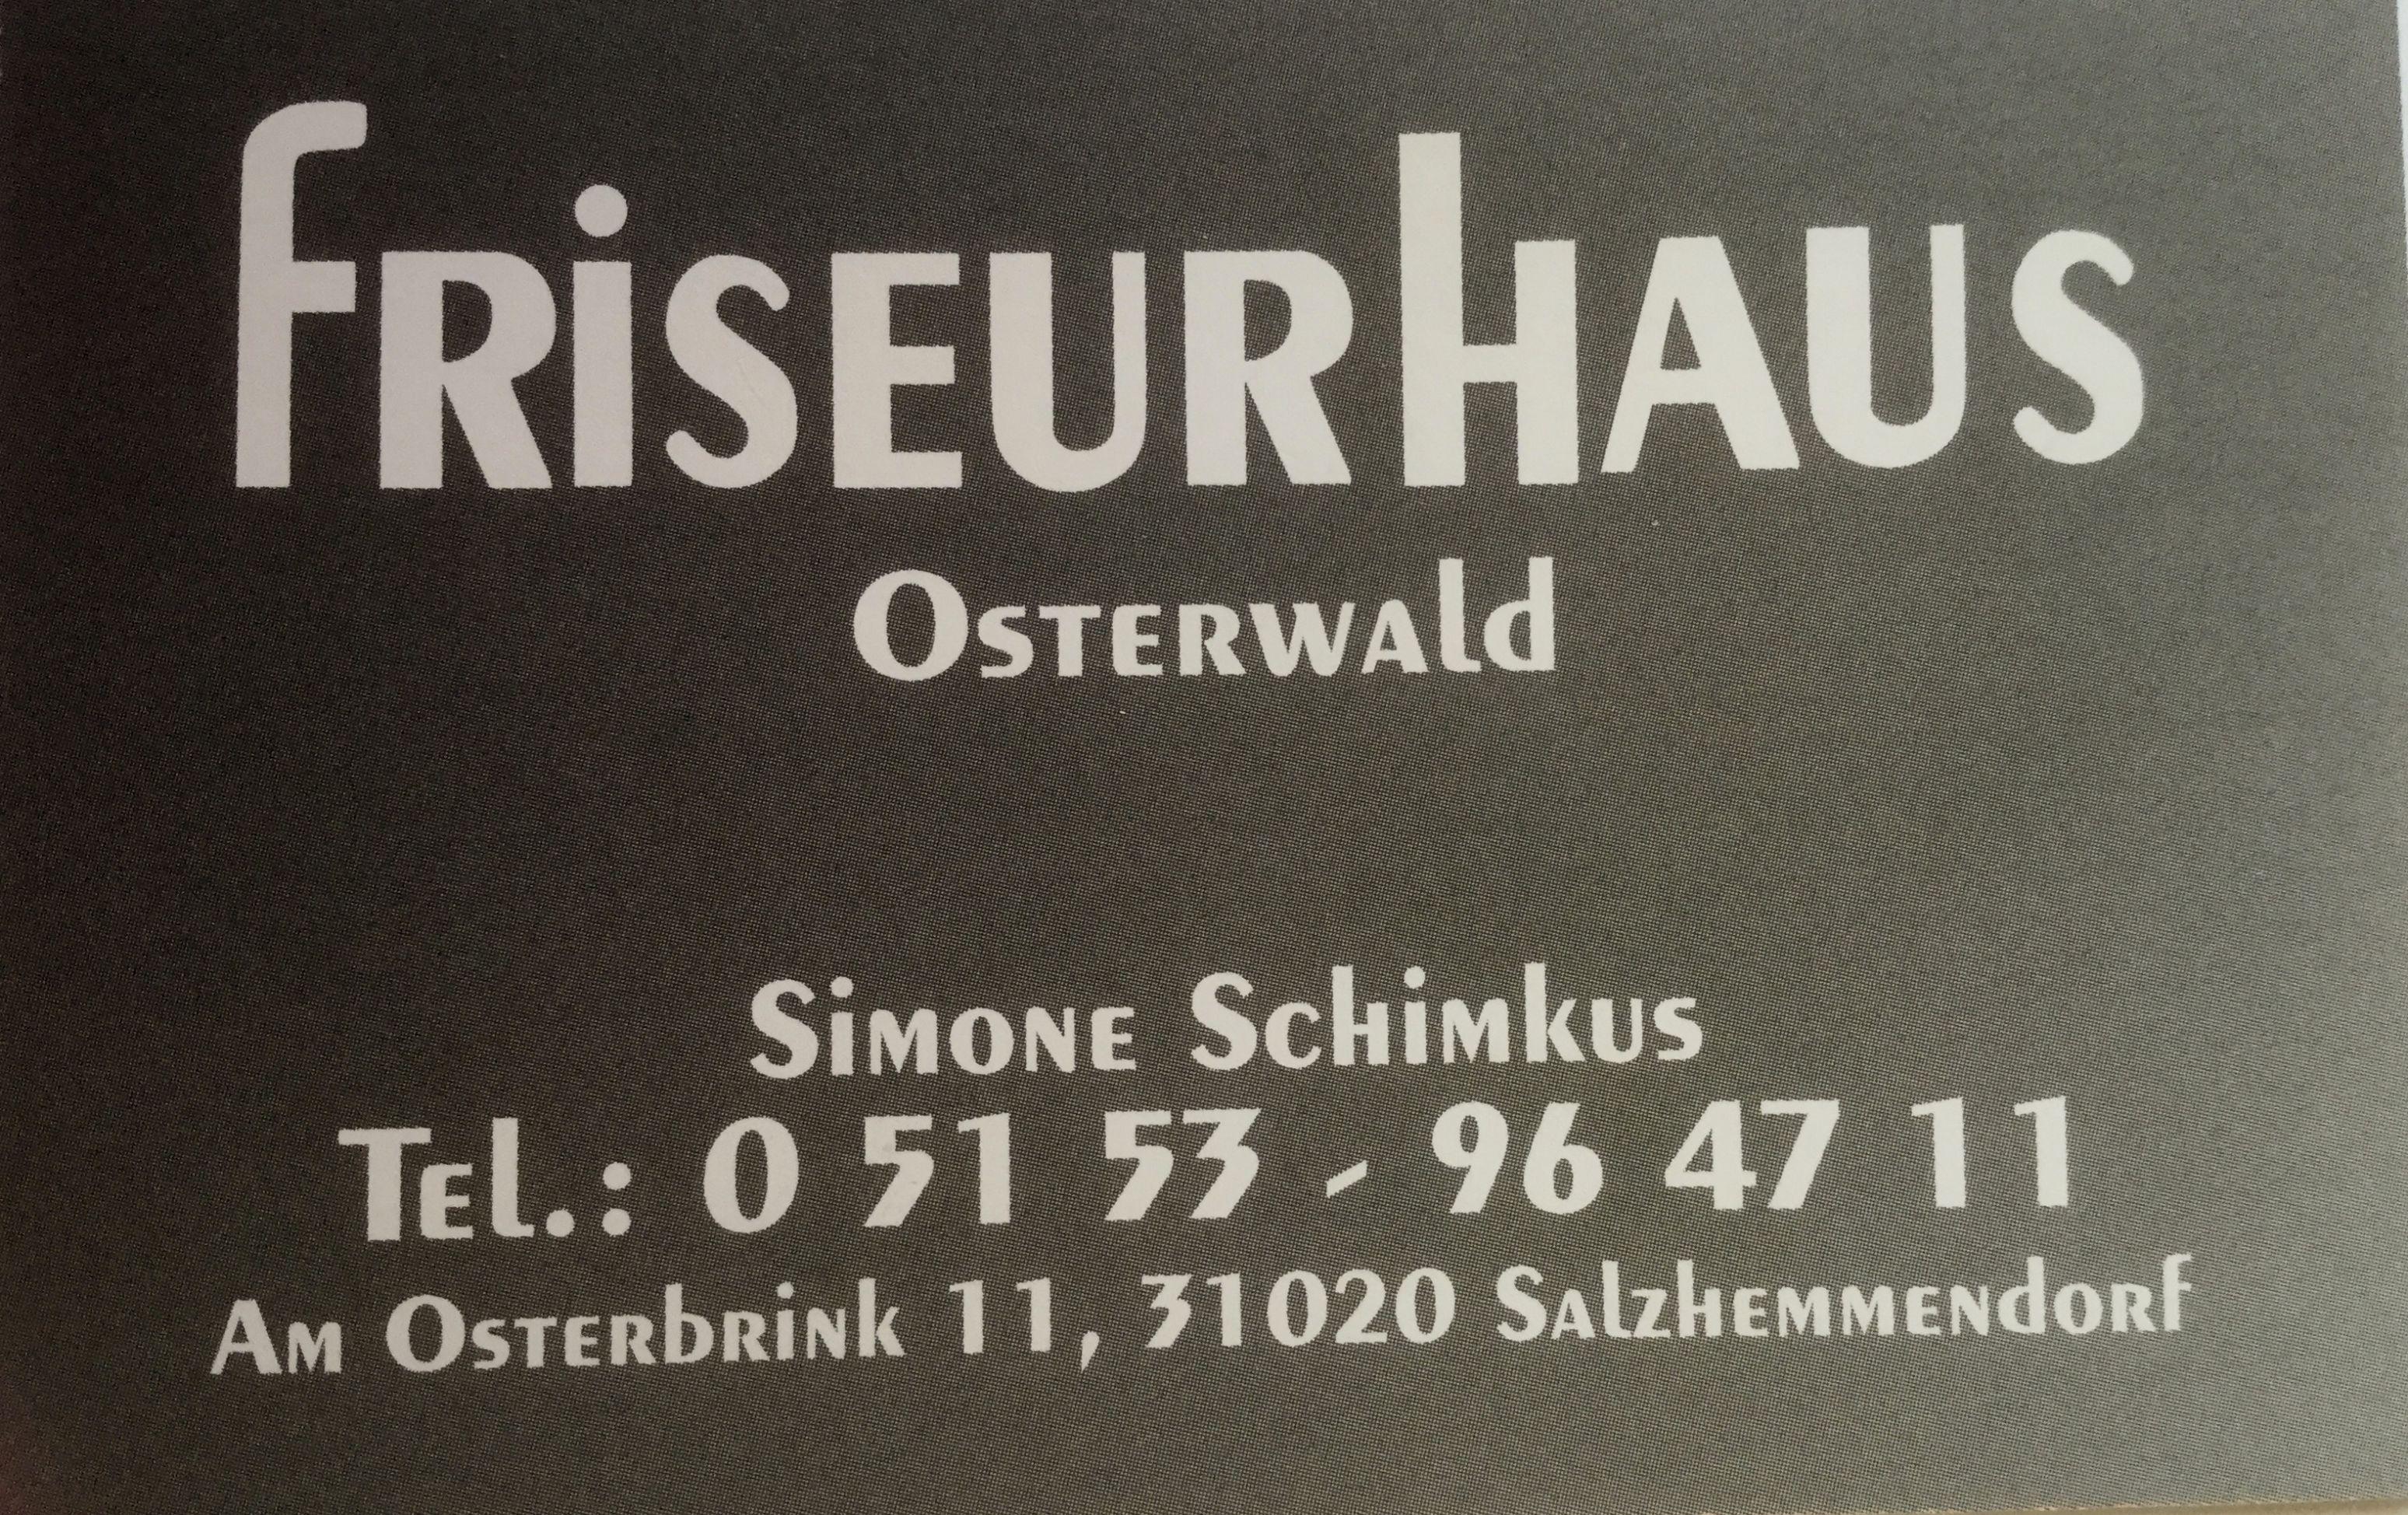 Friseurhaus Osterwald